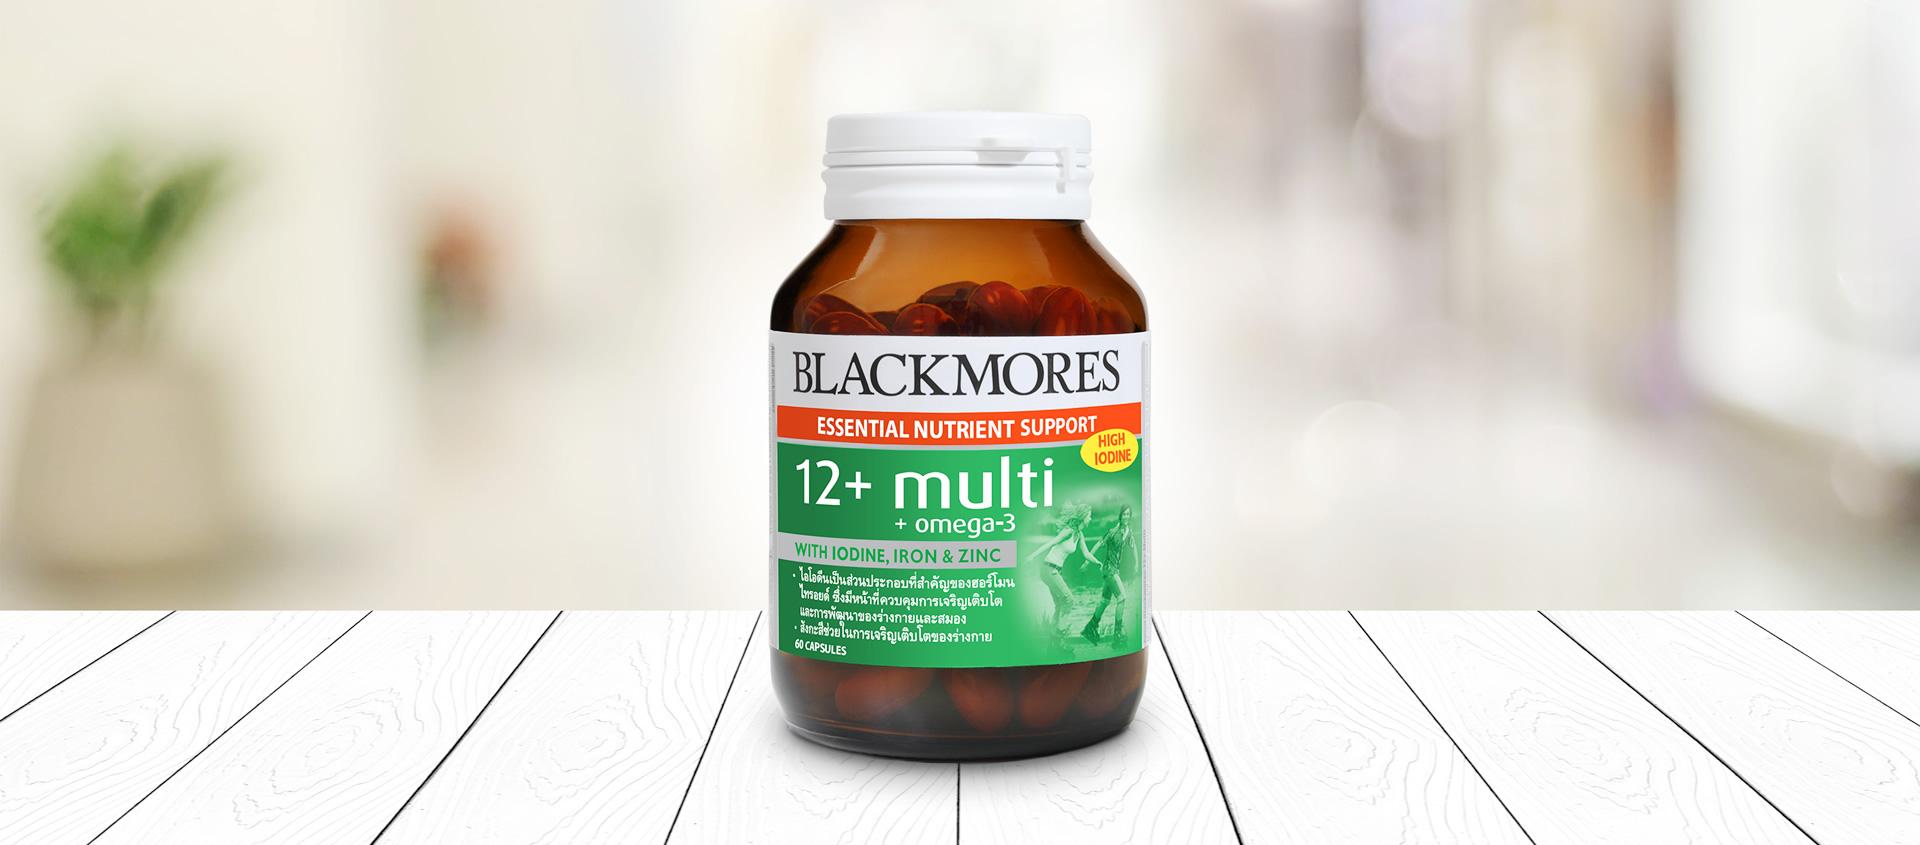 Blackmores 12+ Multi แบลคมอร์ส 12+ มัลติ (ผลิตภัณฑ์เสริมอาหาร)